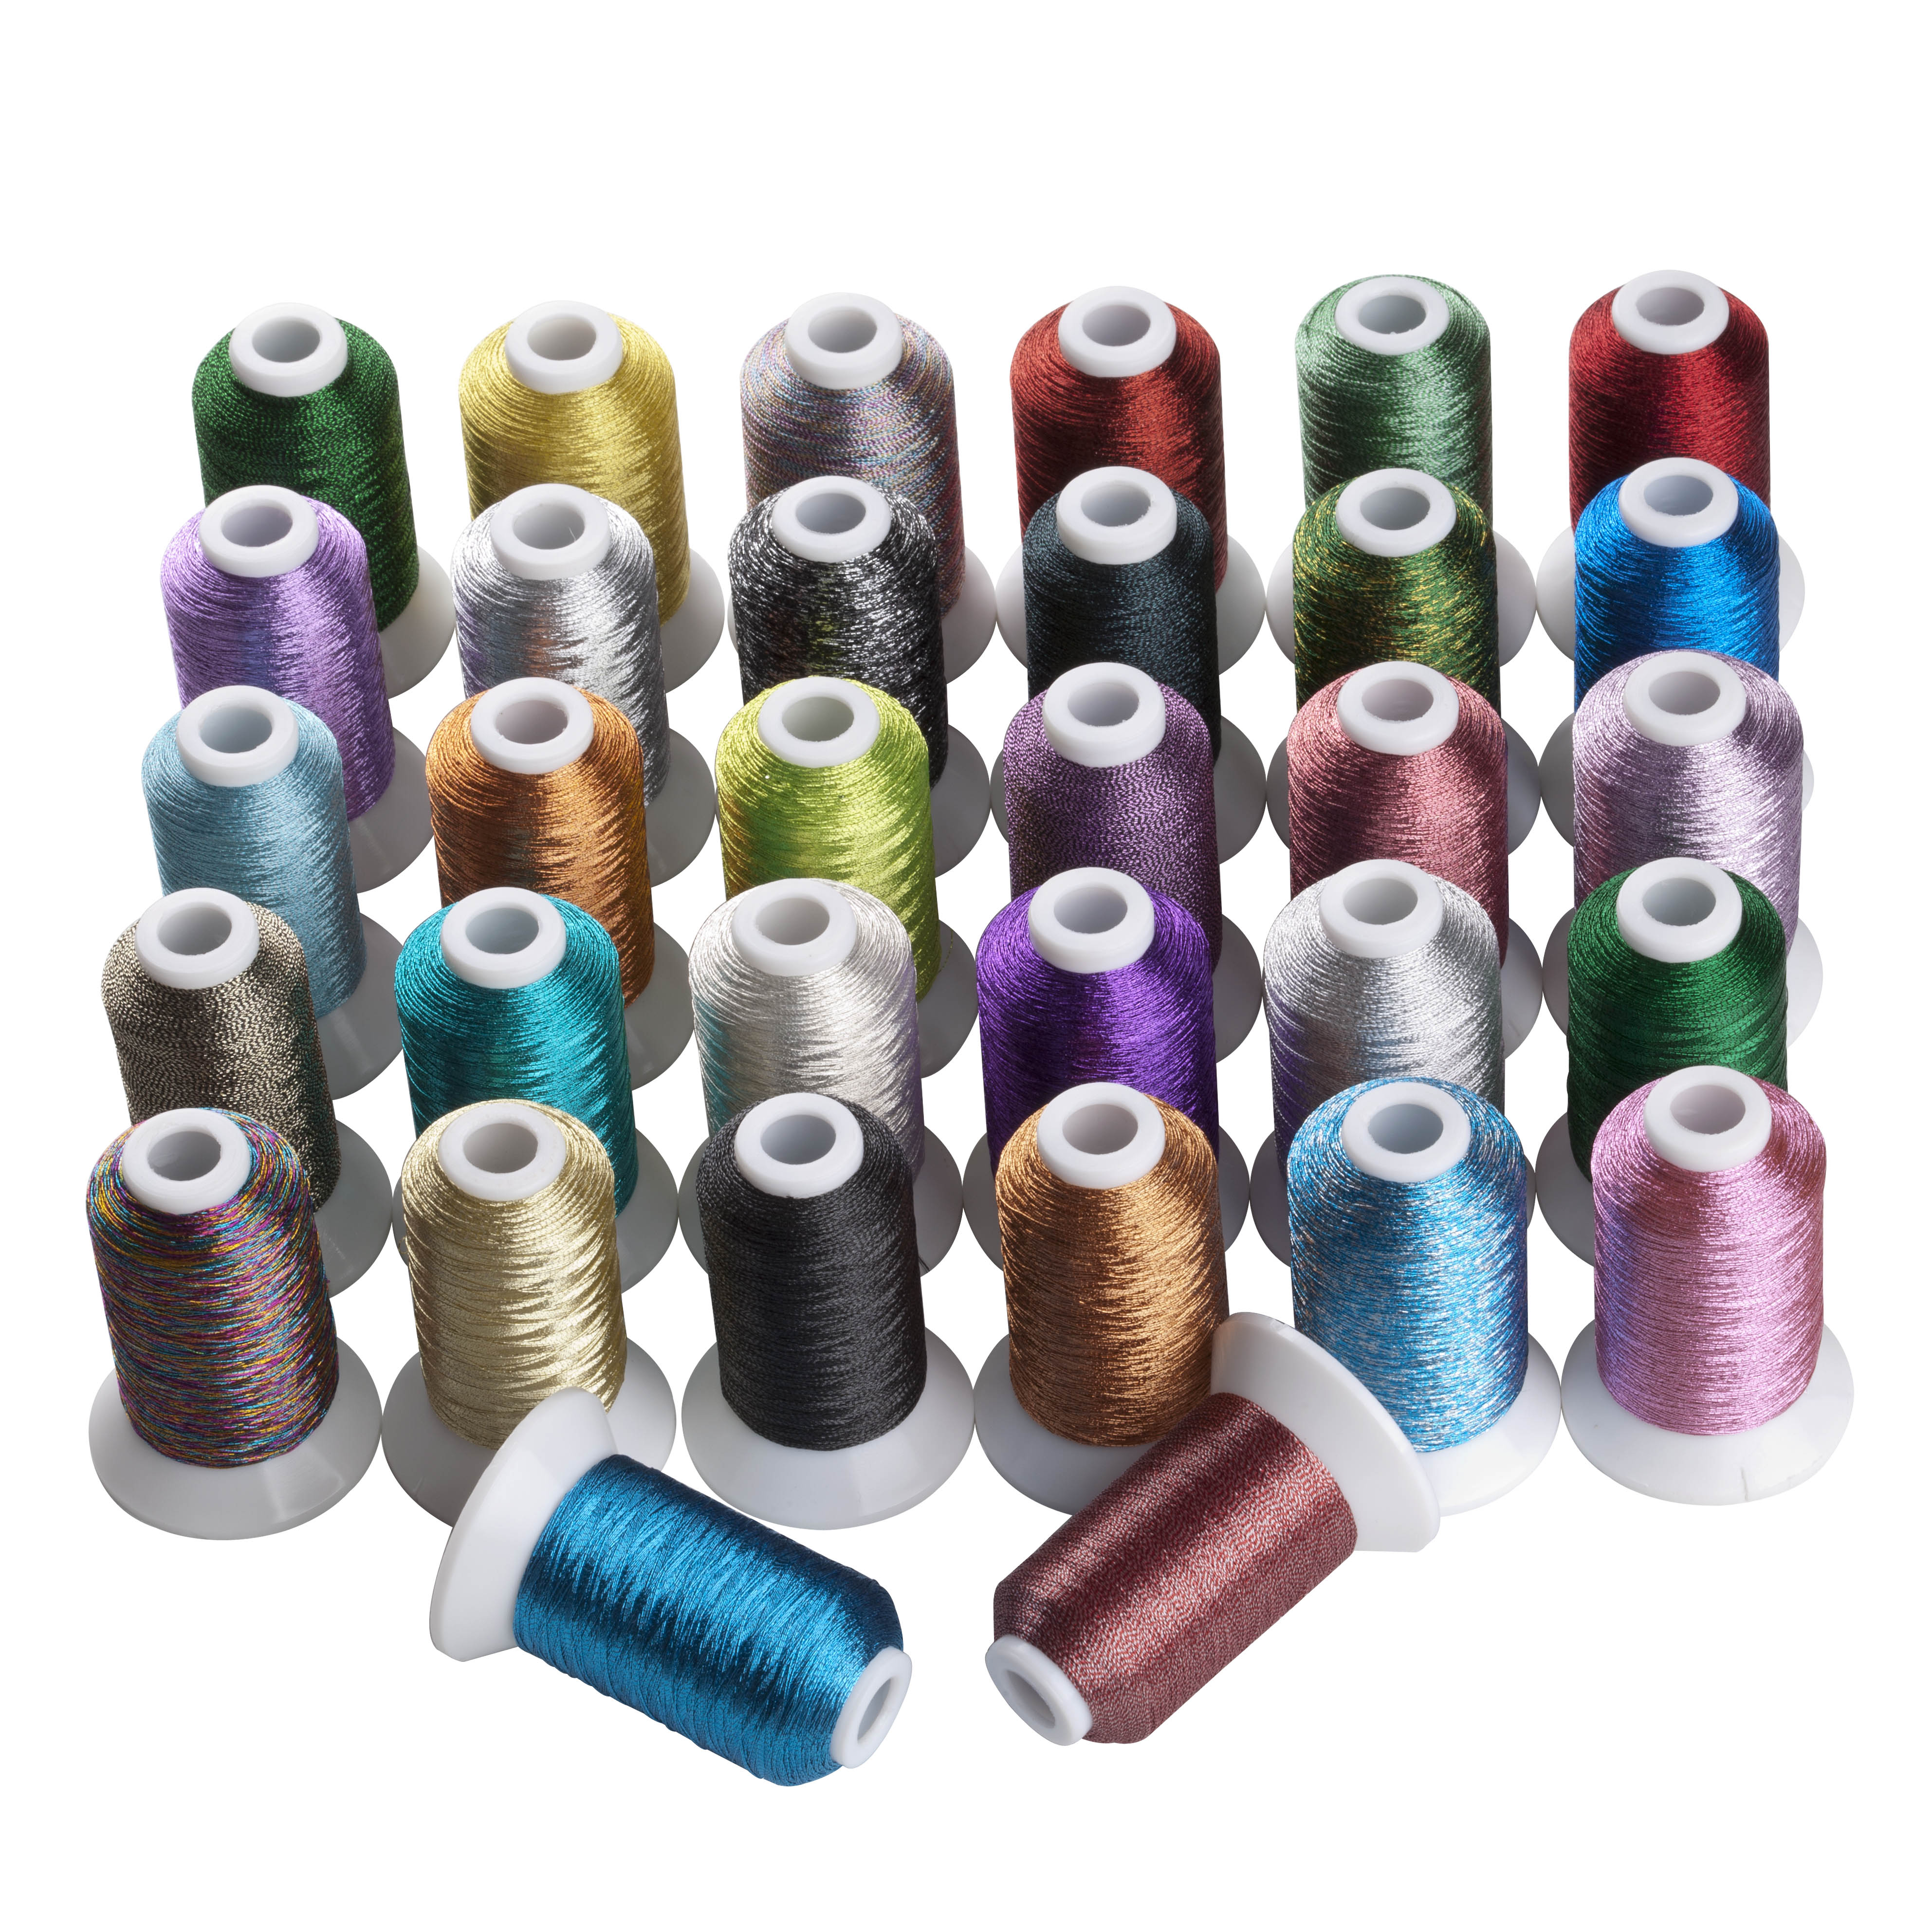 Simthread Brand 500m cone MS Metallic Machine embroidery thread 50pcs Brother Janome Machine A Bobbin with